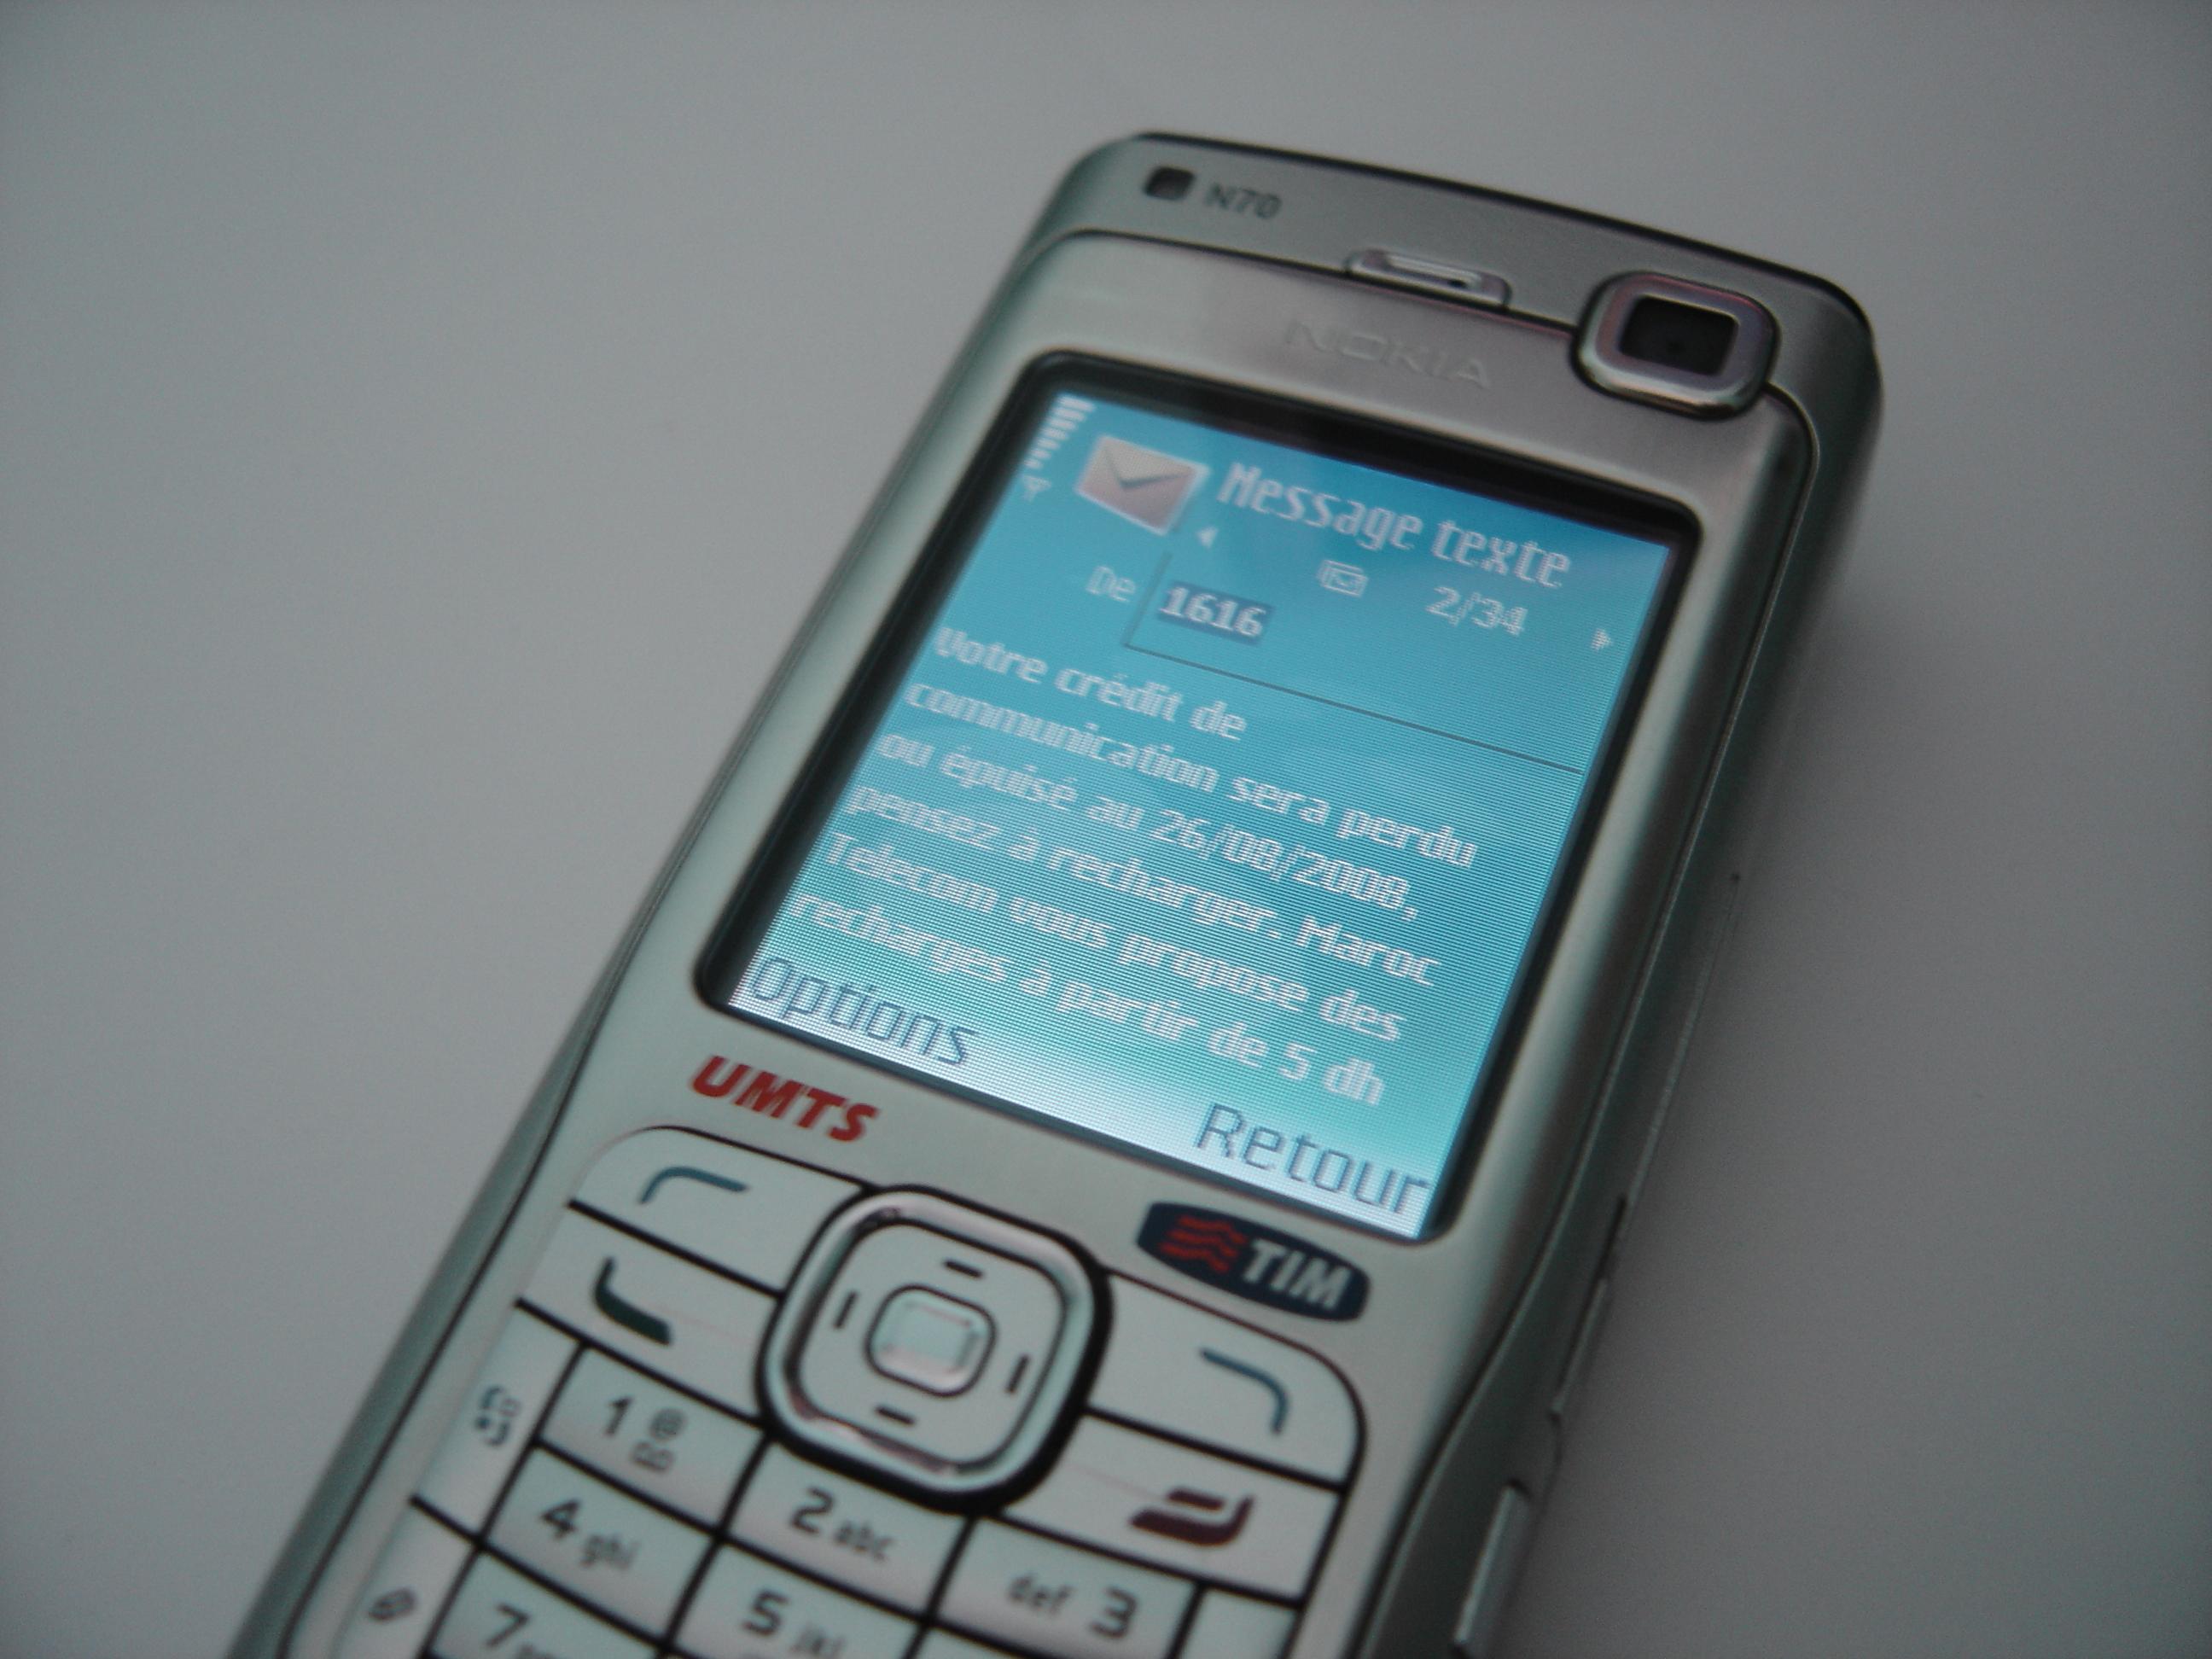 Nokia c3 code sms spy